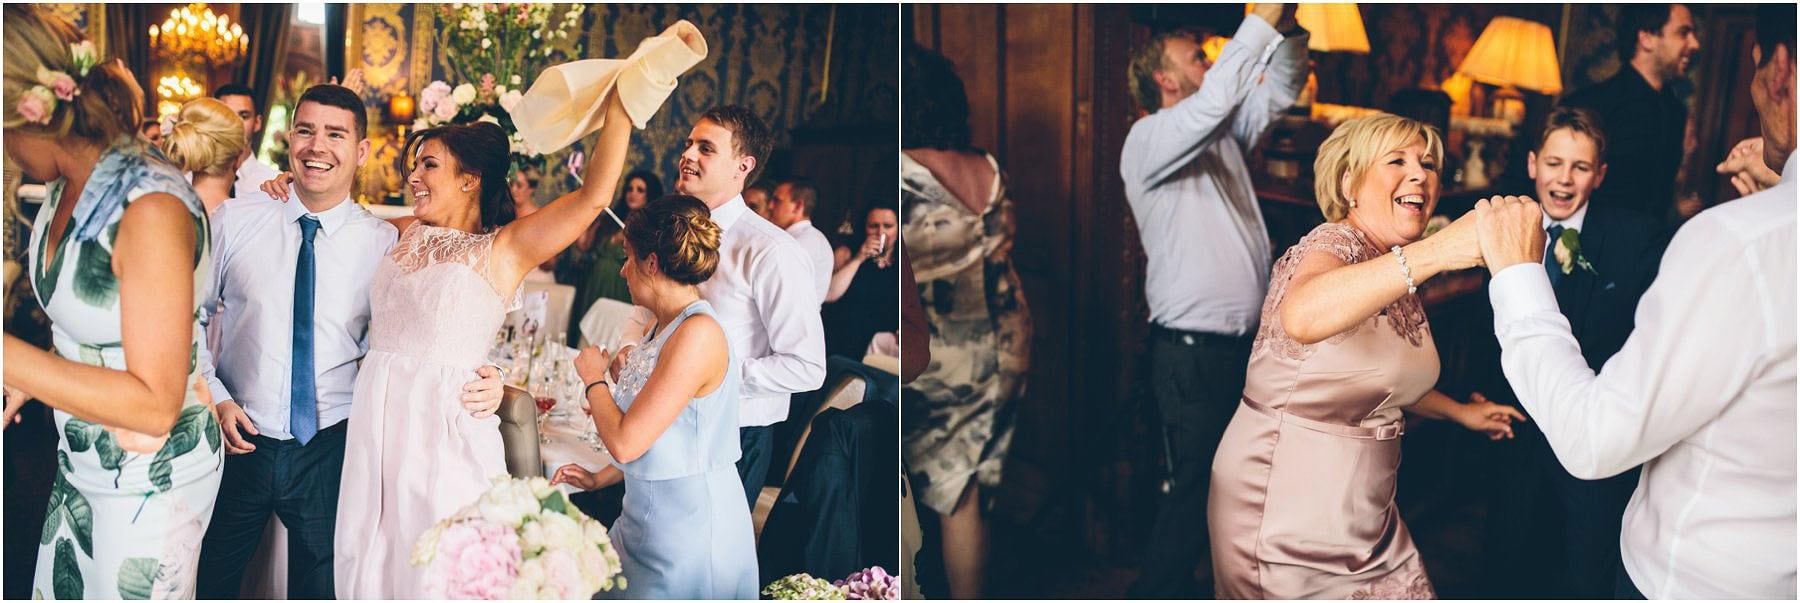 Soughton_Hall_Wedding_Photography_0114